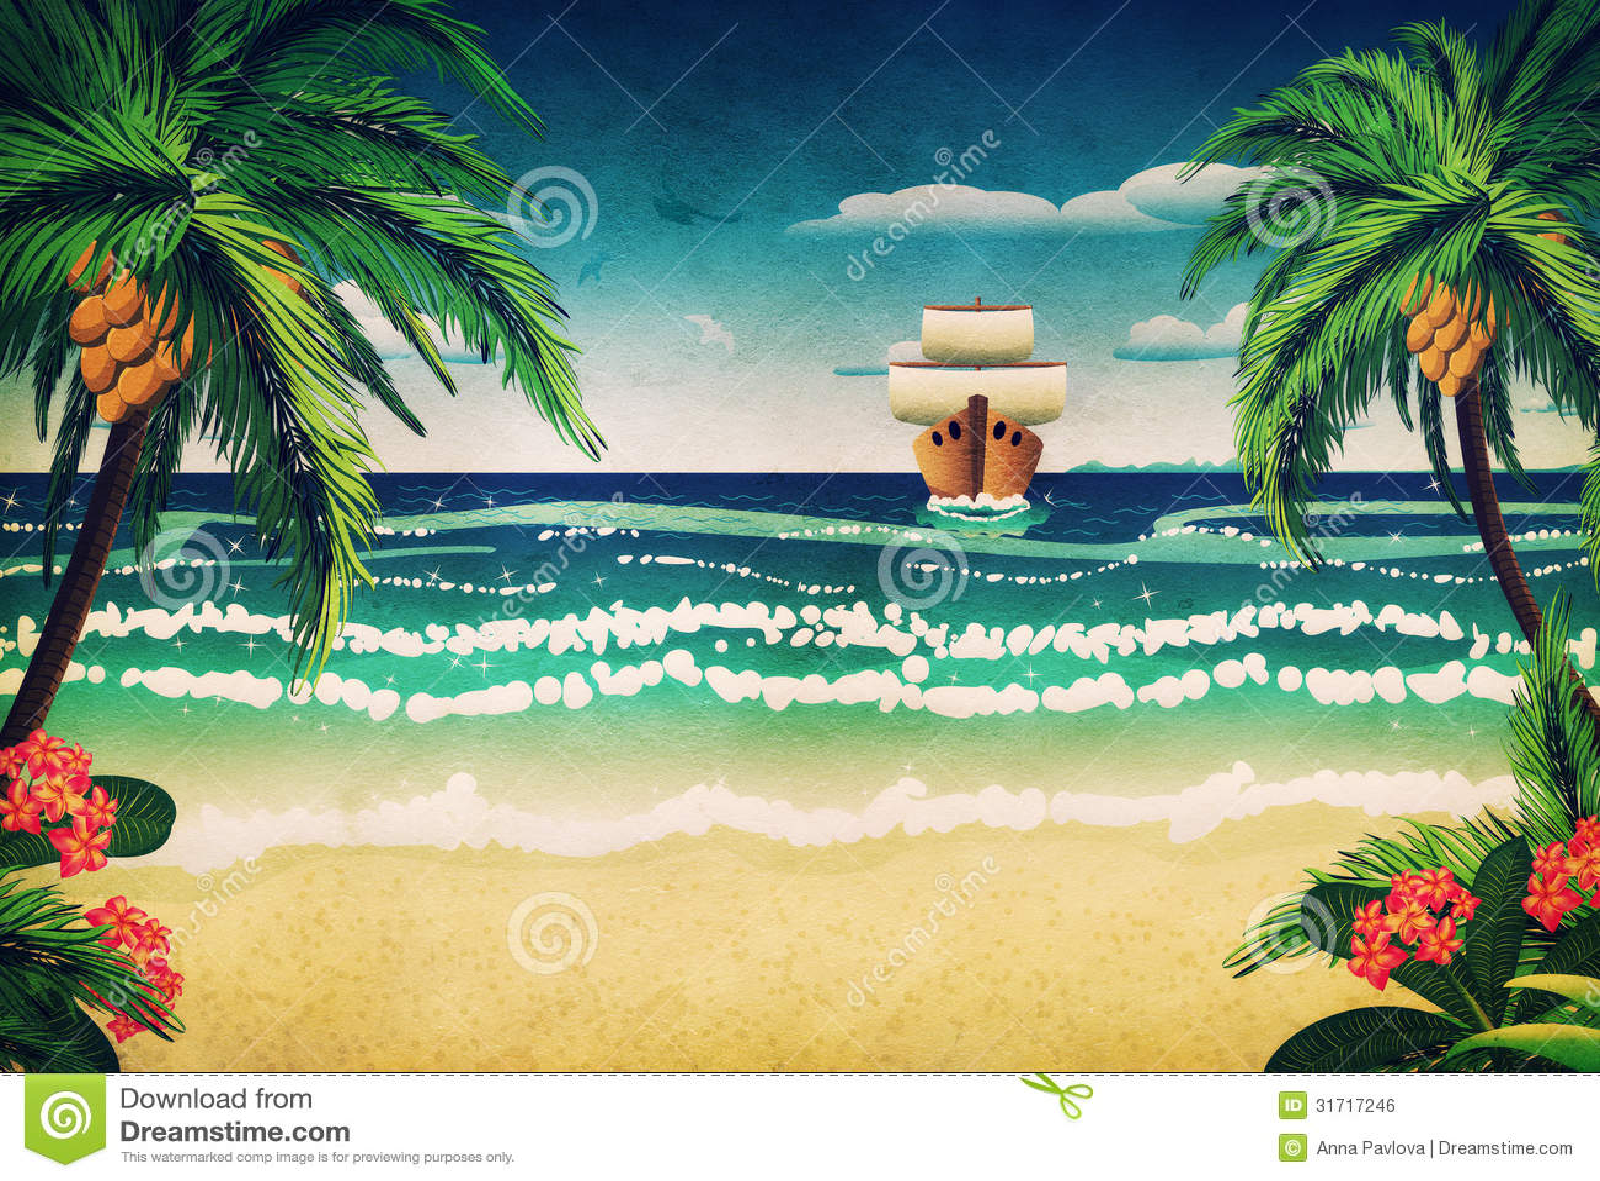 Cartoon boat and beach stock illustration. Image of tree - 31717246